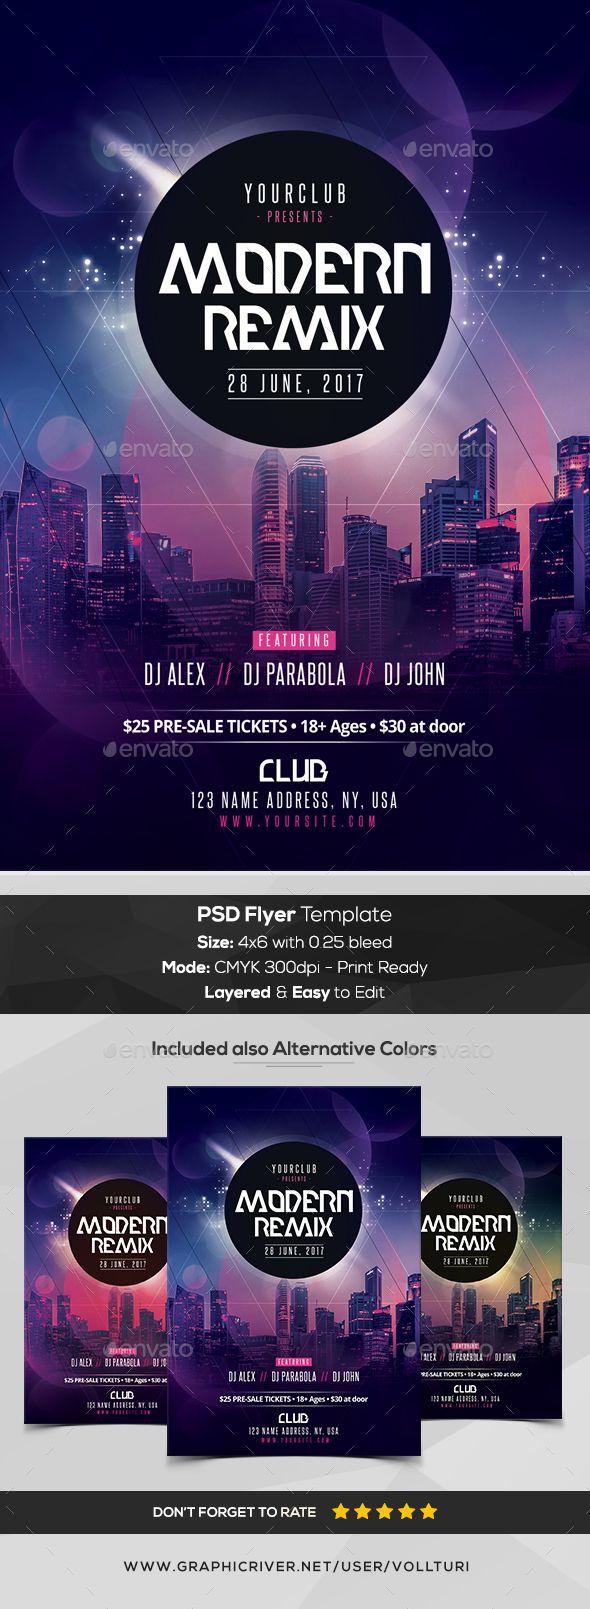 Modern Remix - PSD Flyer Template - #Flyers Print Templates Download Here:      https://graphicriver.net/item/modern-remix-psd-flyer-template/20107972?ref=suz_562geid